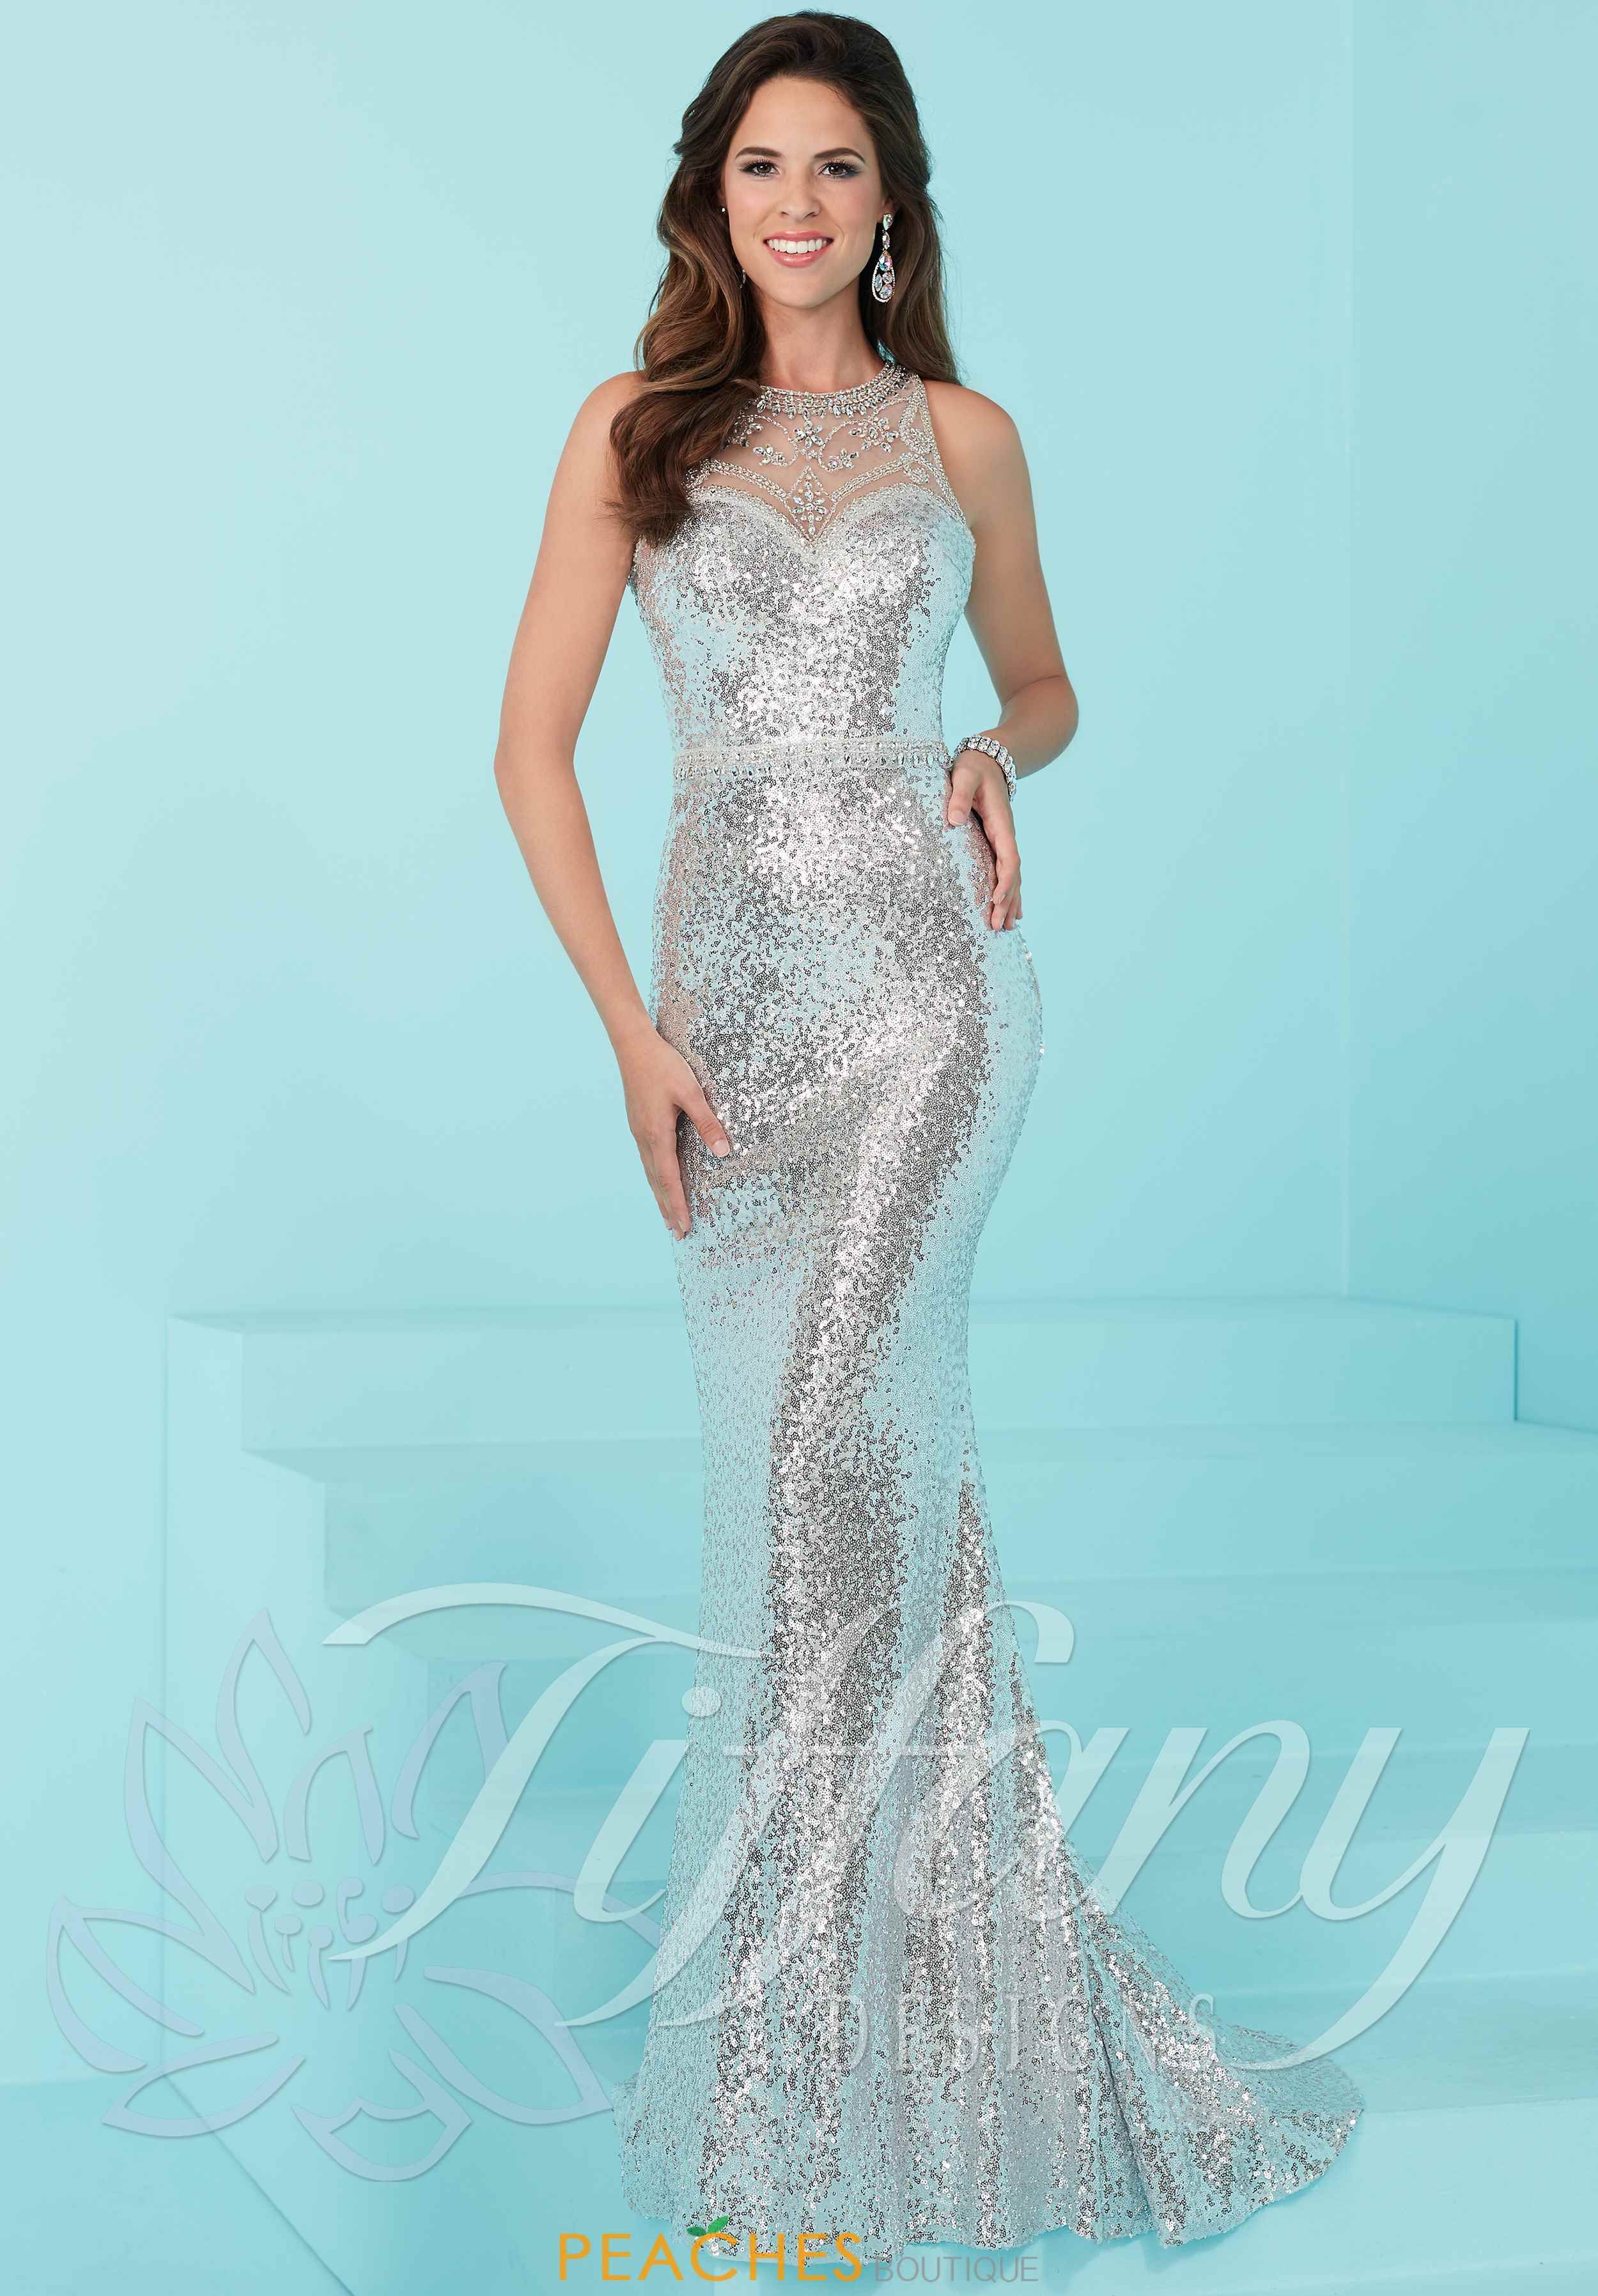 c417337318 Tiffany Long Beaded Dress 16220. Tiffany Long Beaded Dress 16220 Sequin Prom  Dresses ...